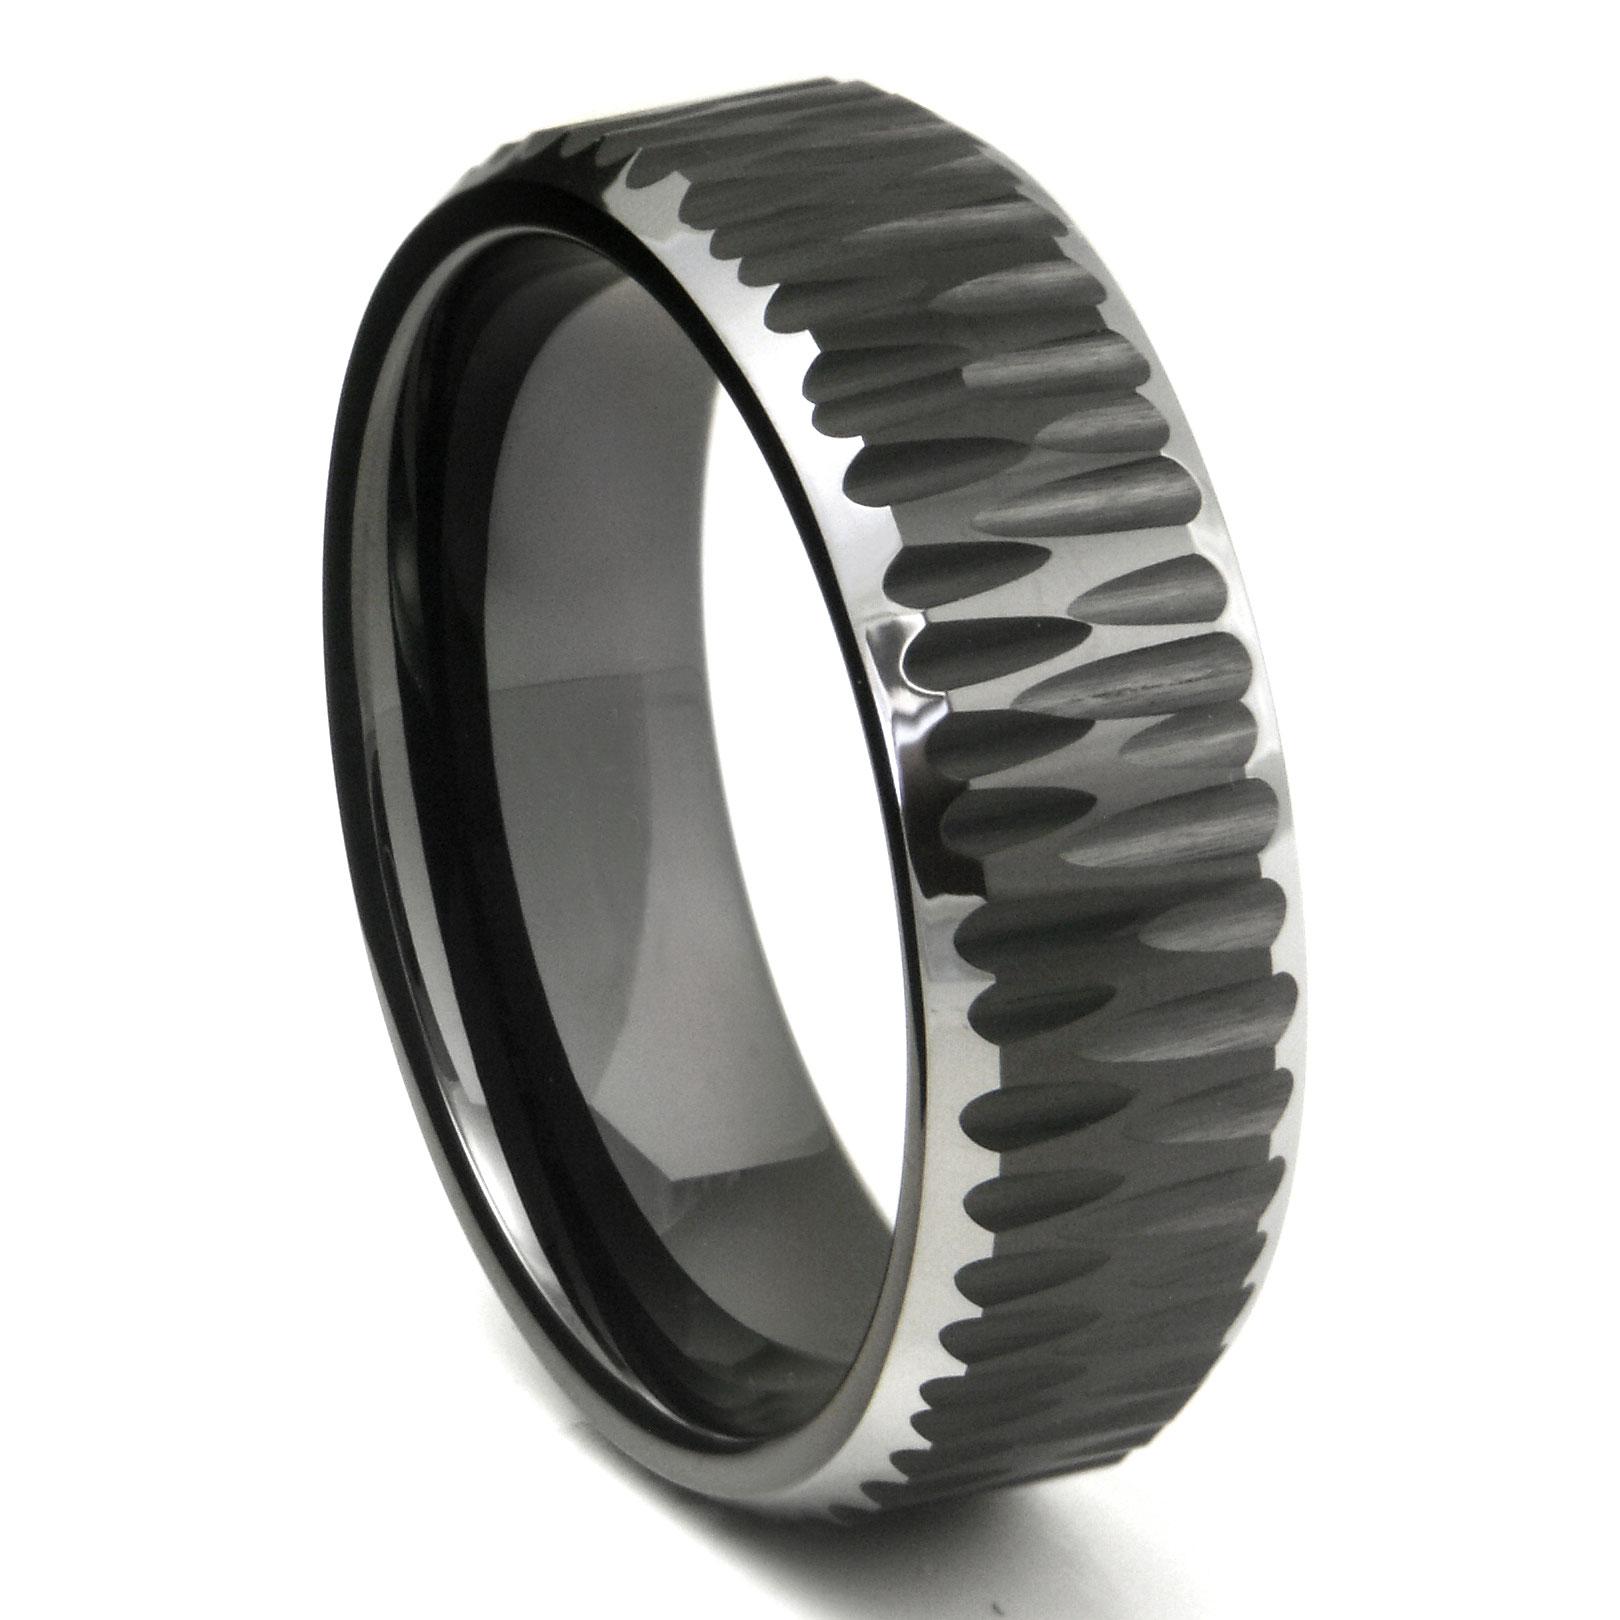 Black Tungsten Carbide Hammer Finish Beveled Wedding Band Ring P tungsten hammered wedding band Loading zoom